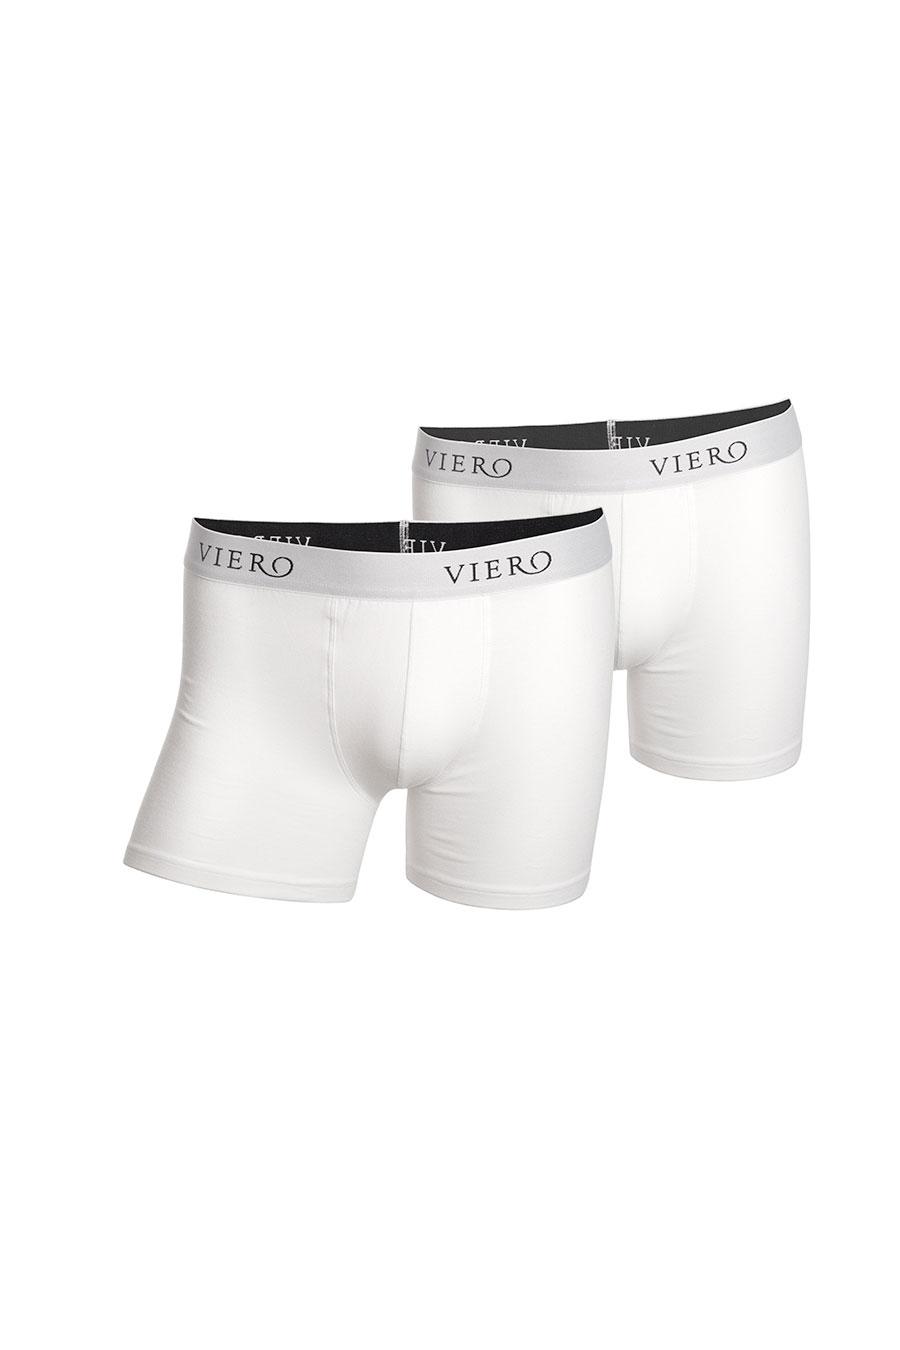 2-pack hvite boxershortser fra Viero Milano